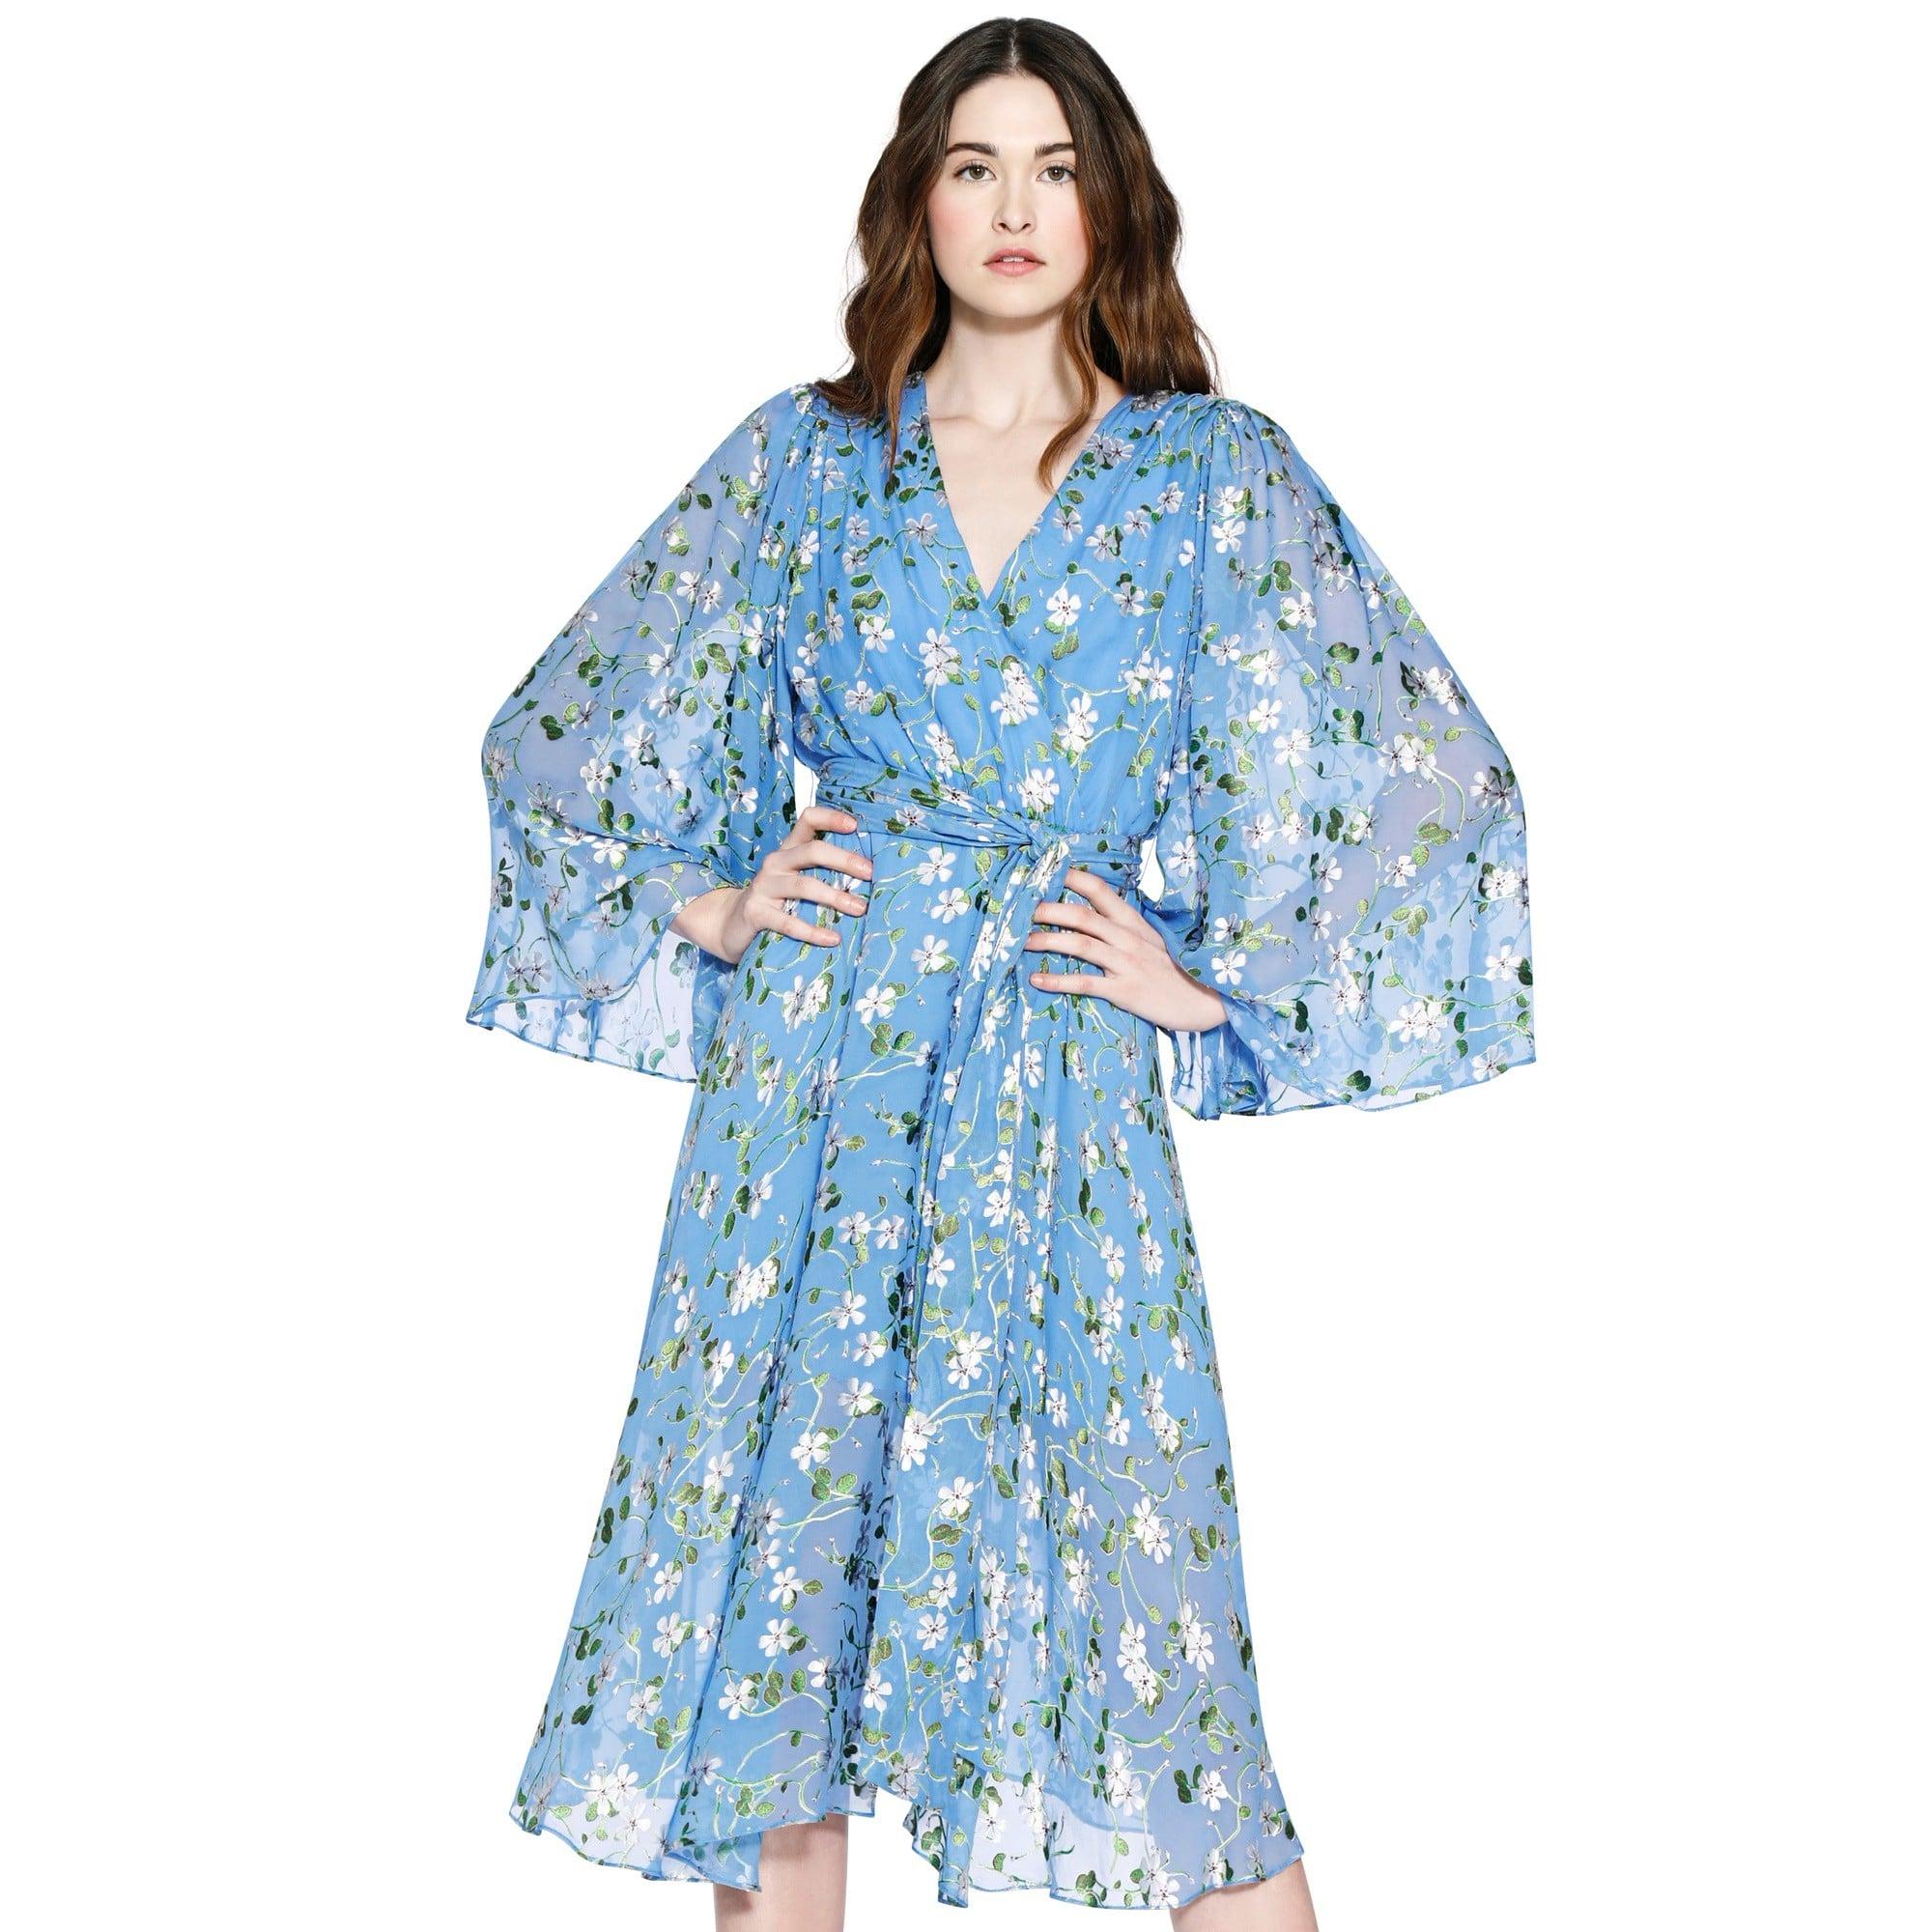 23d5d05f1415f Diane von Furstenberg Cybil Silk Jersey Banded Wrap Dress | Best Wrap  Dresses 2018 | POPSUGAR Fashion UK Photo 14